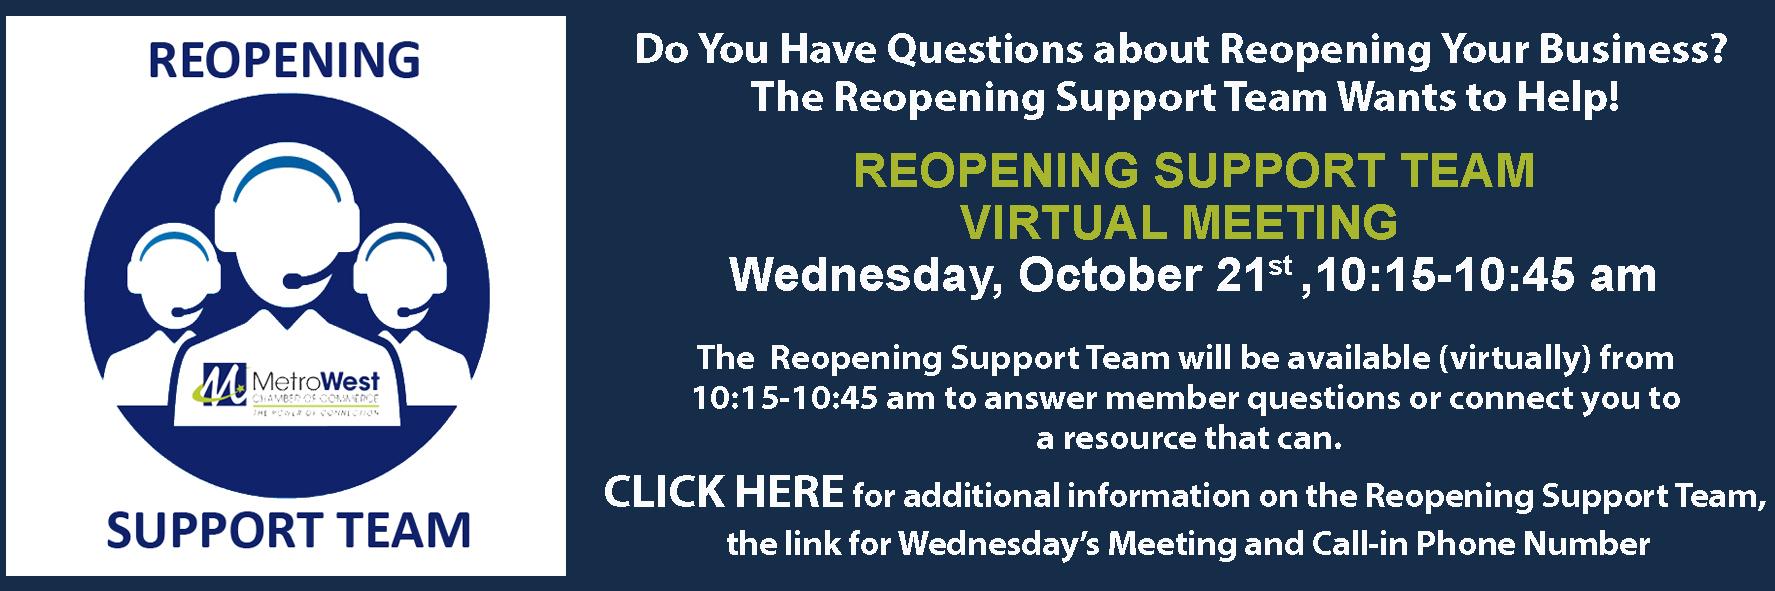 Reopening-Support-Team-10-21-2020-web-Slider.jpg